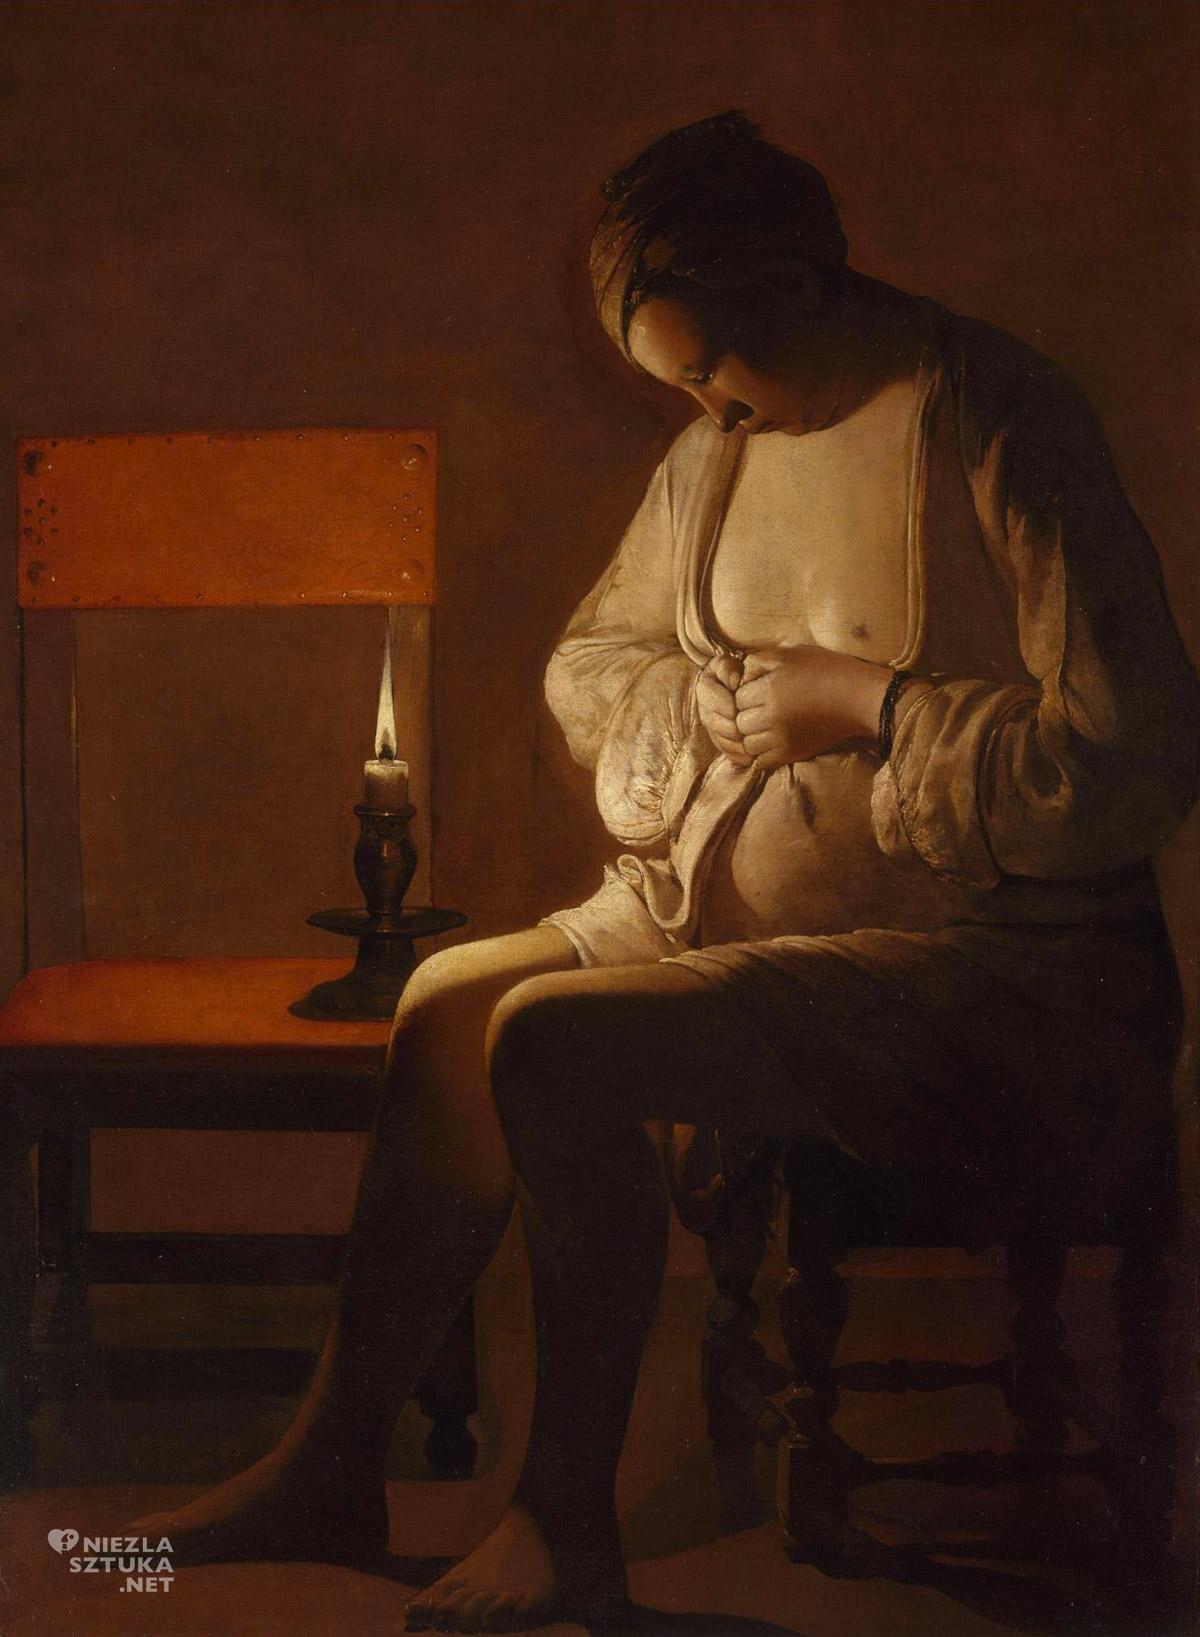 Georges de La Tour, Kobieta z pchłą. barok, sztuka francuska, Niezła Sztuka